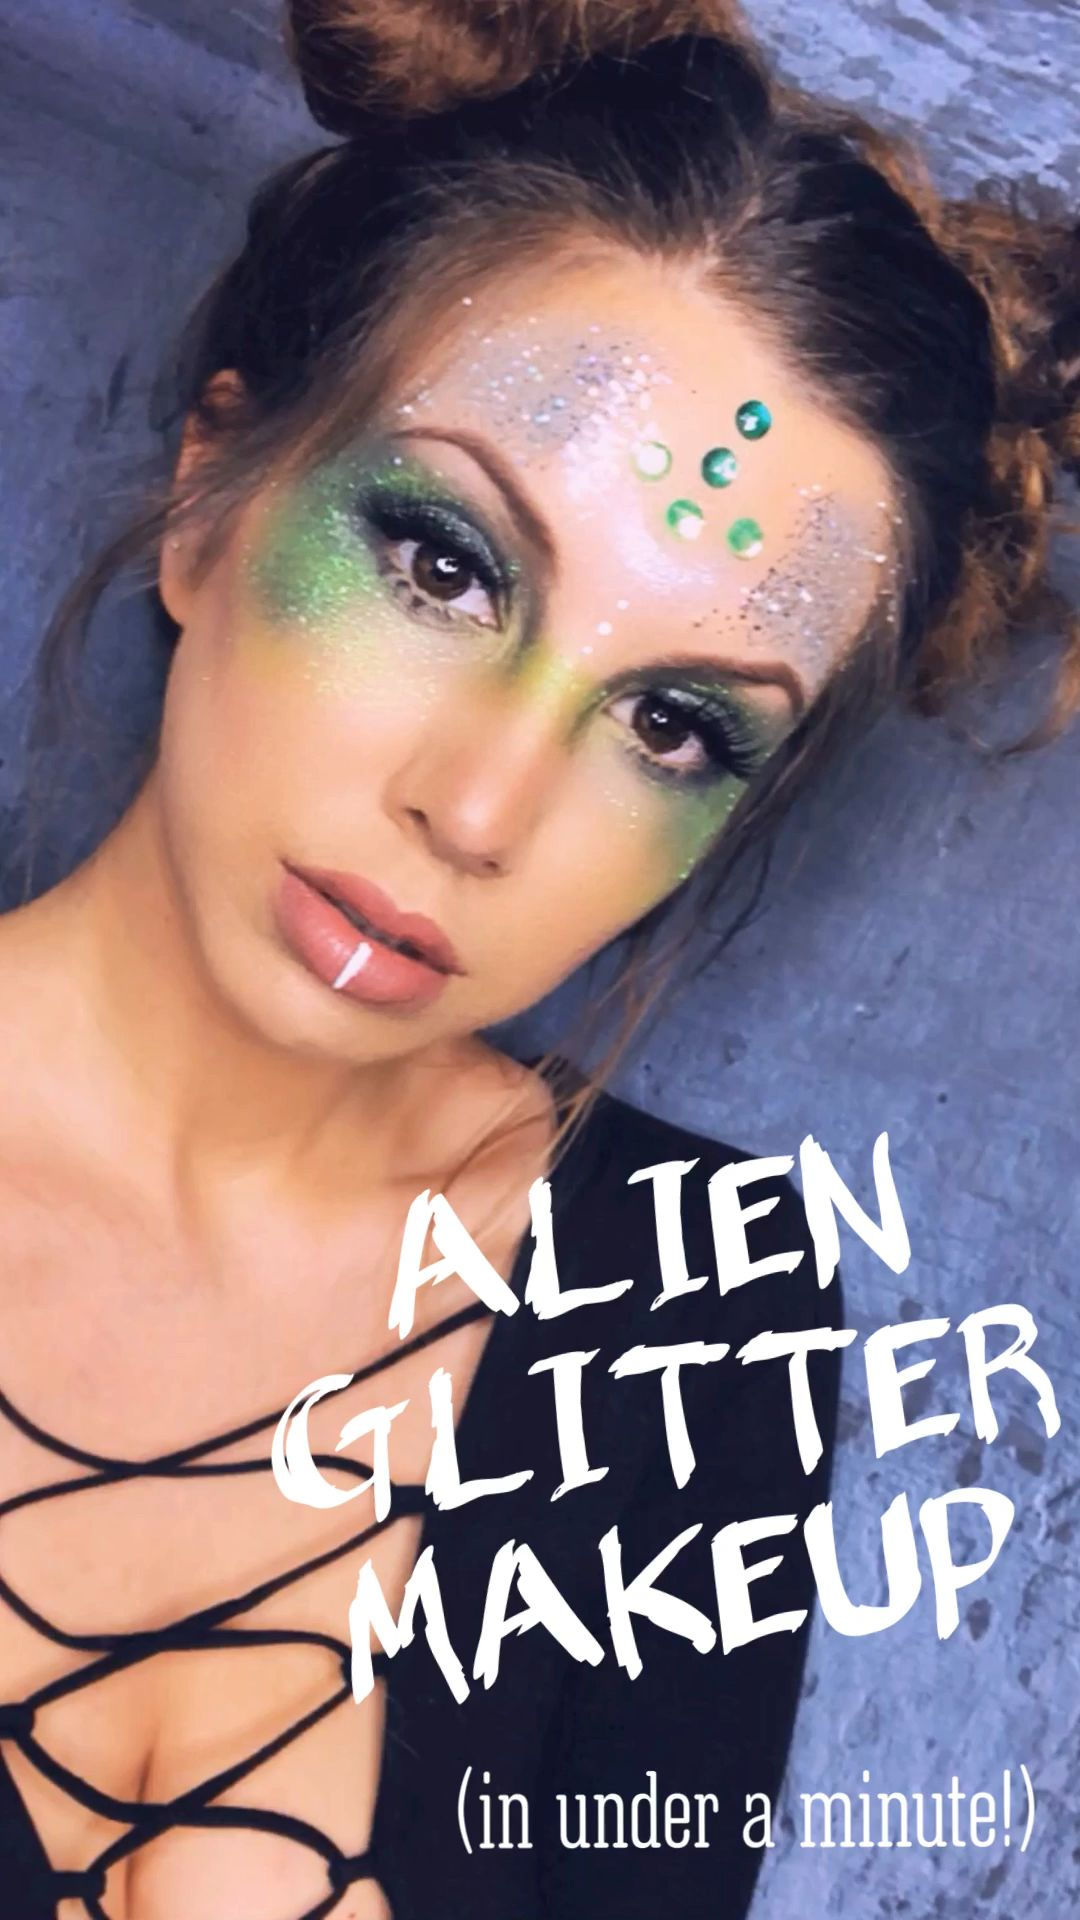 Alien Glitter Makeup | Alien Makeup Eyes | Alien Eye Makeup | Alien Costume